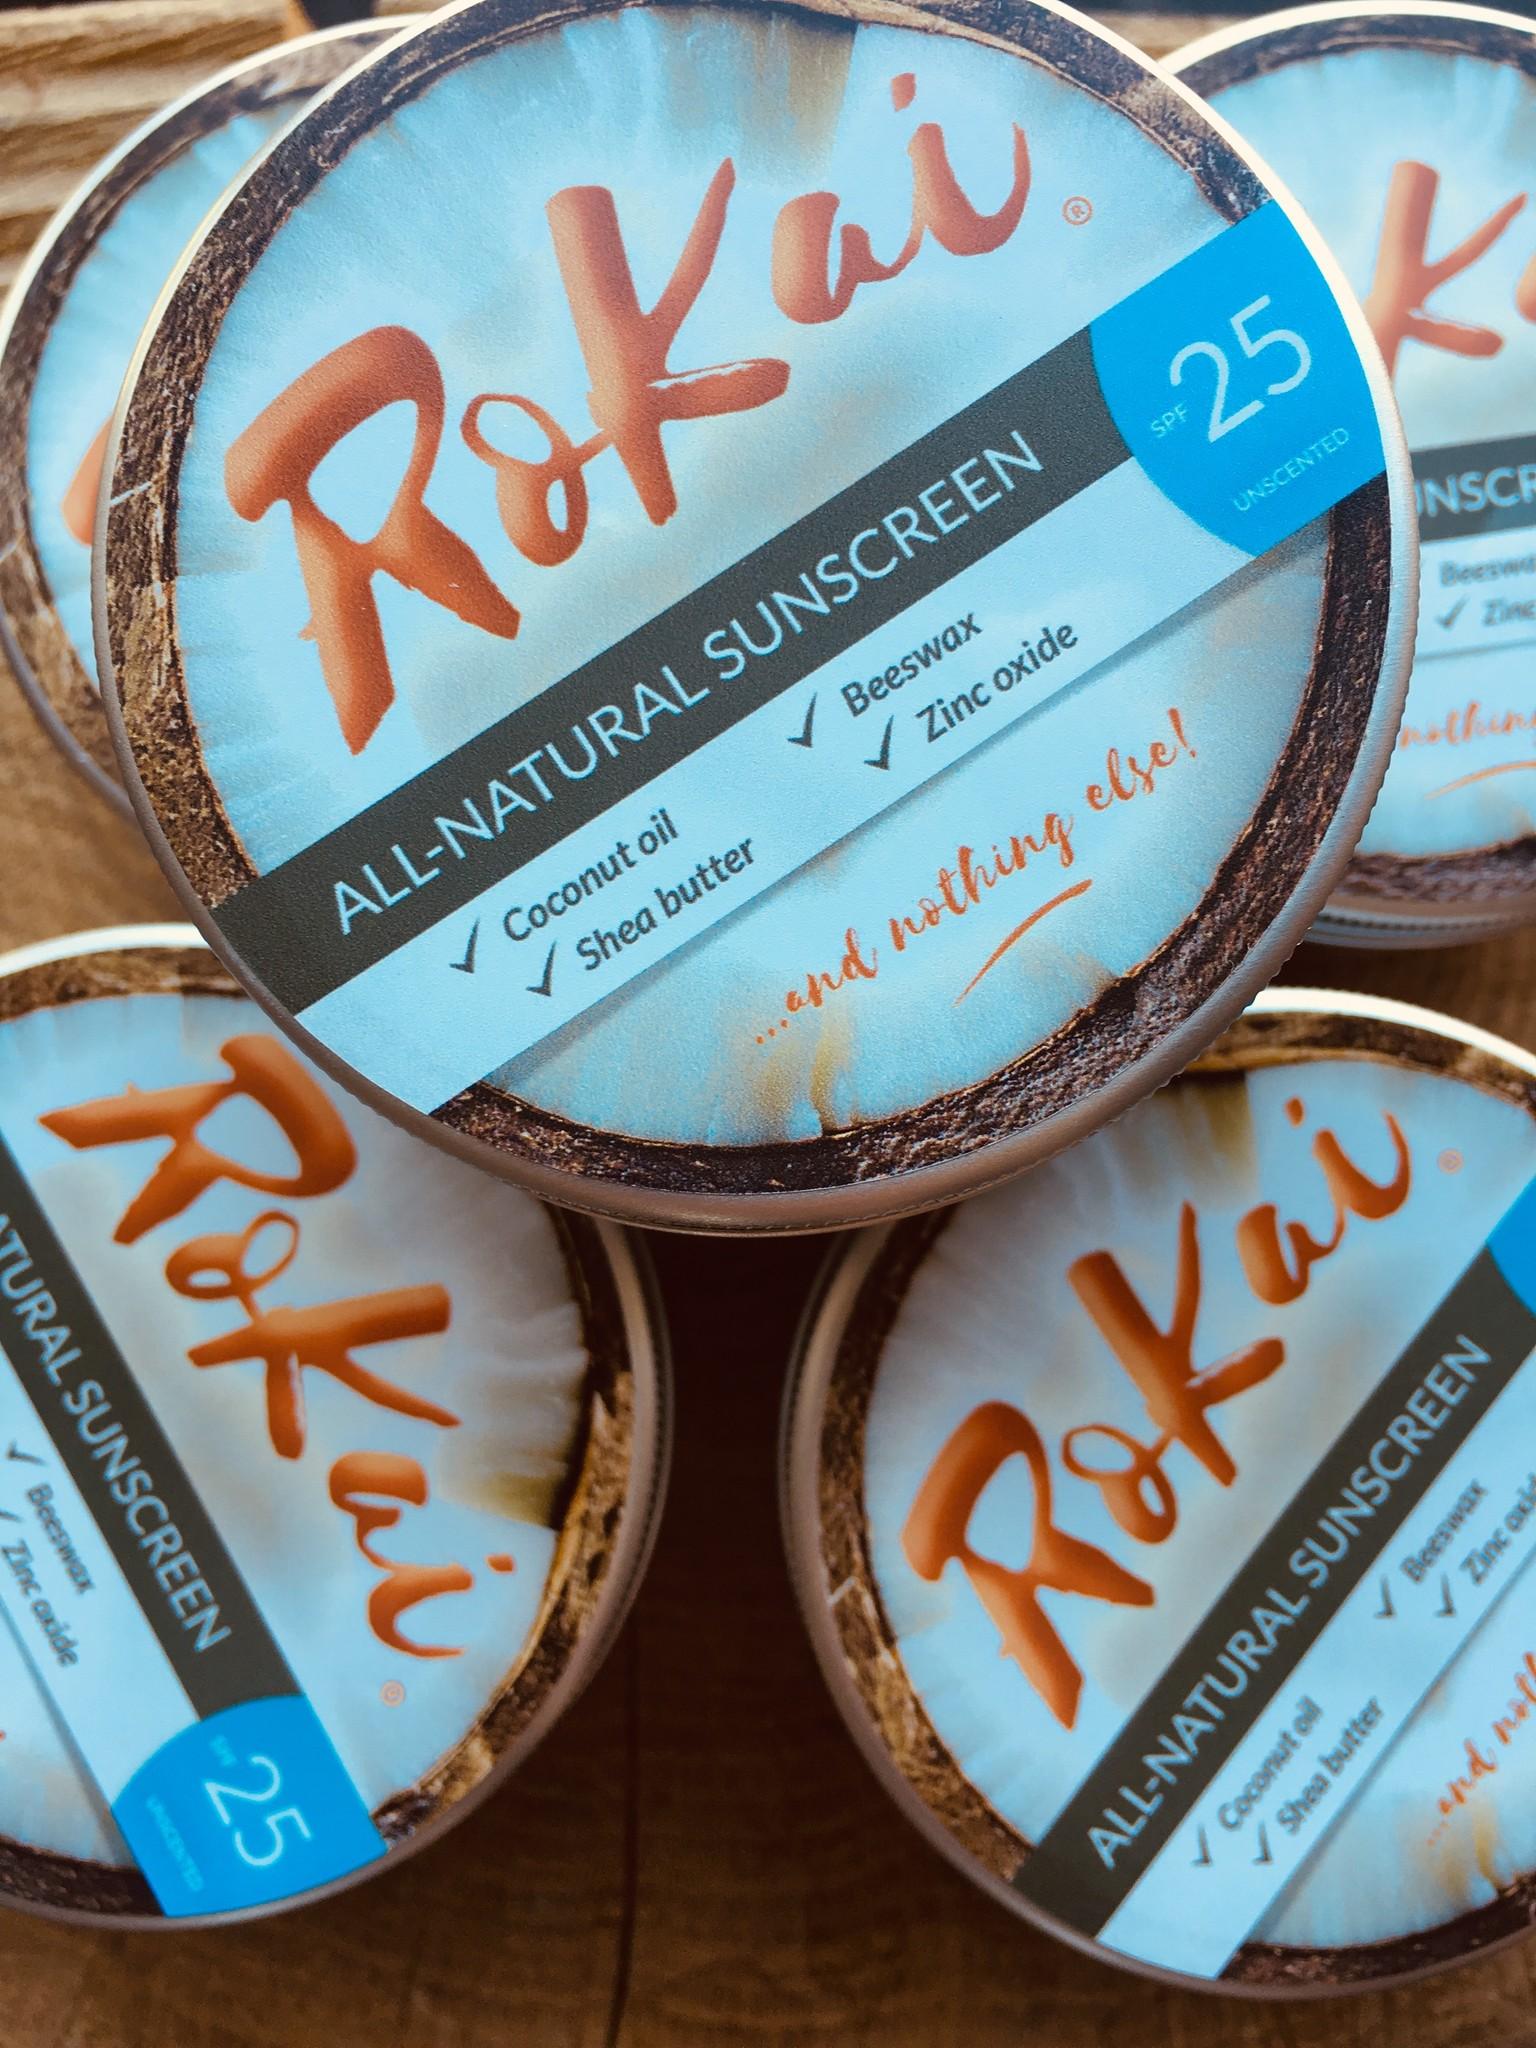 ROKAI 100% Natuurlijke Zero Waste Zonnecrème  - Breedspectrum  - 25 SPF